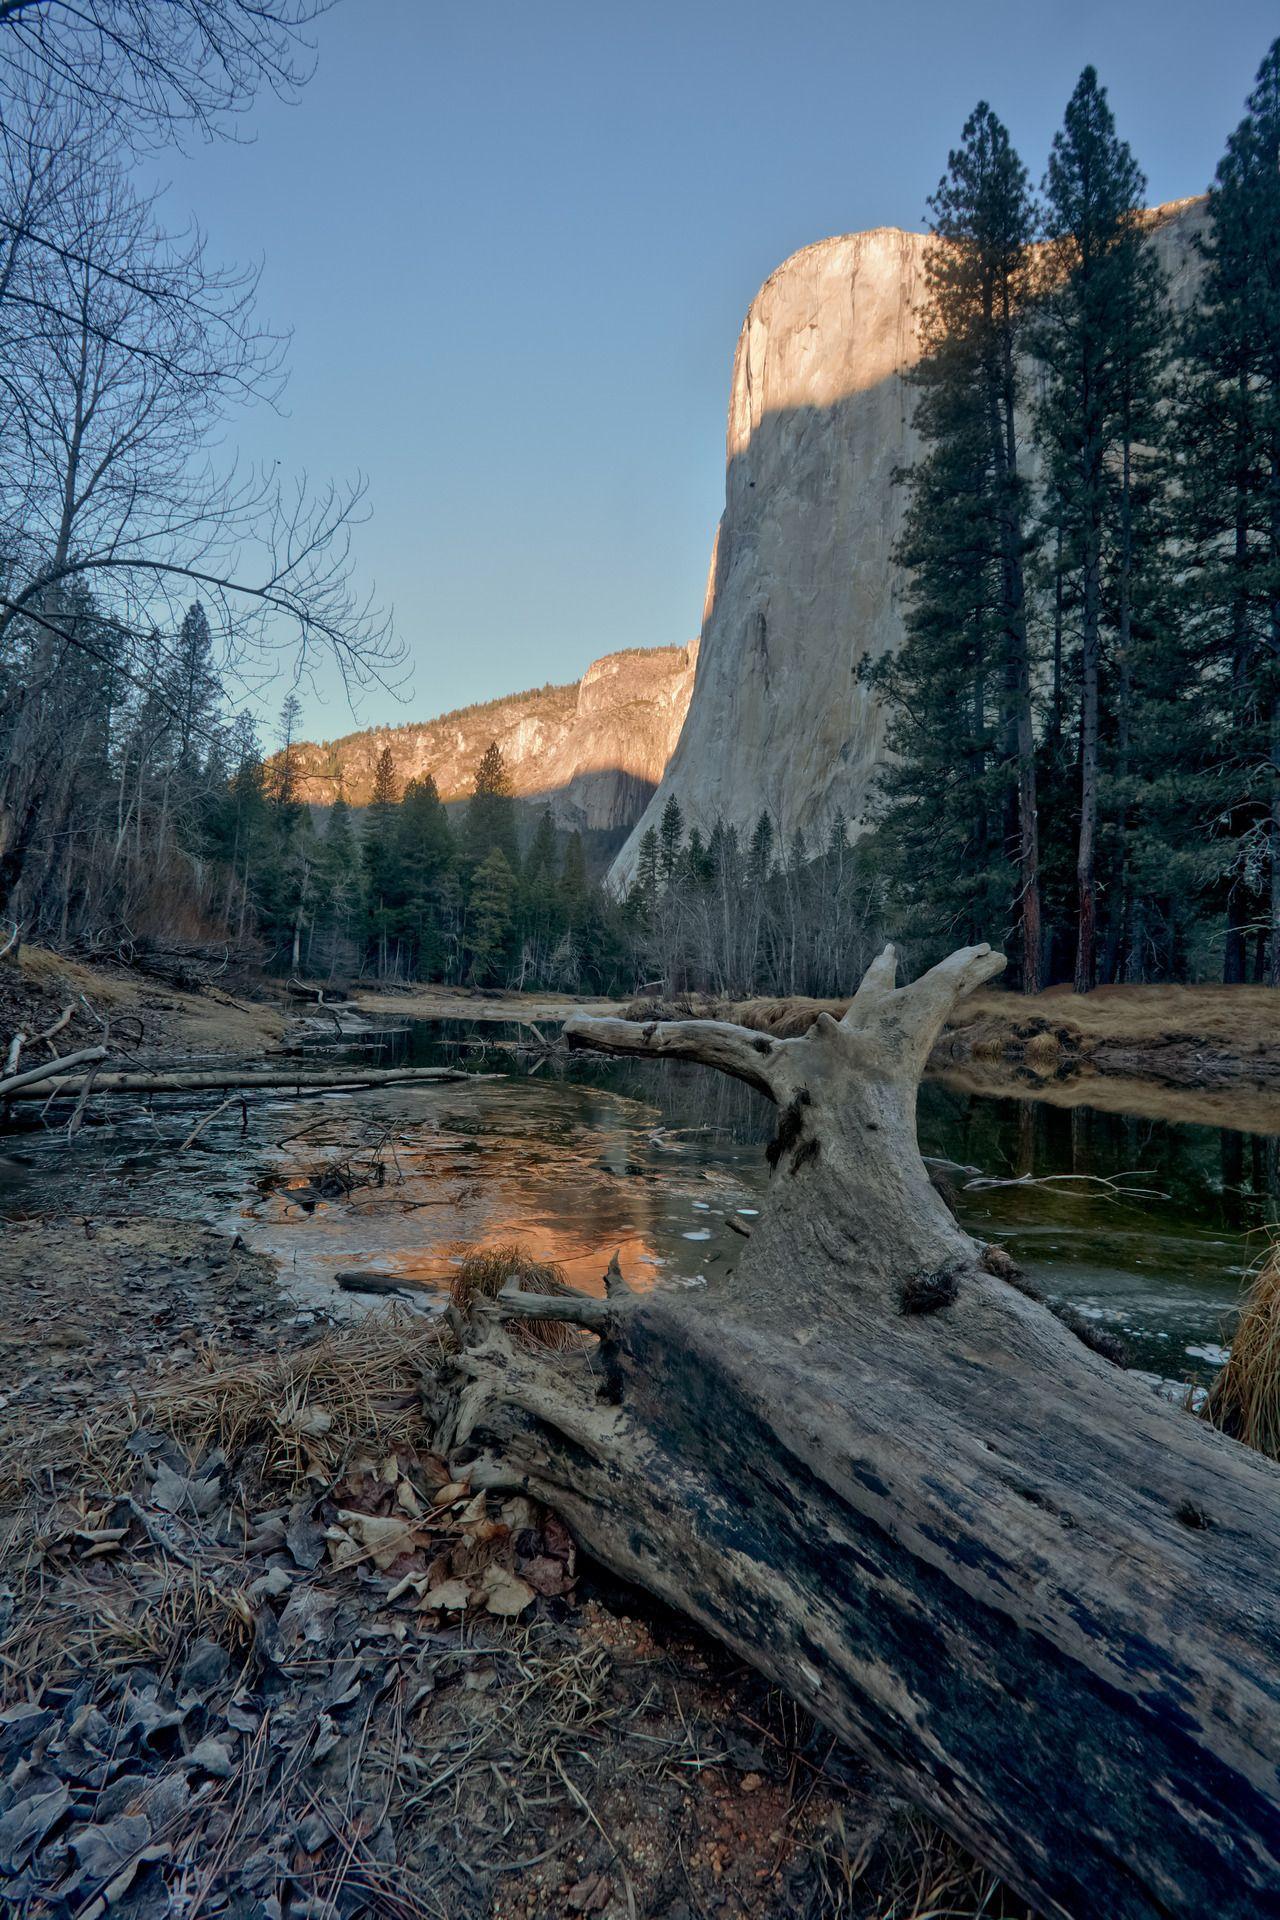 About-usa: Yosemite National Park - California - USA (byAlbert de Bruijn) -